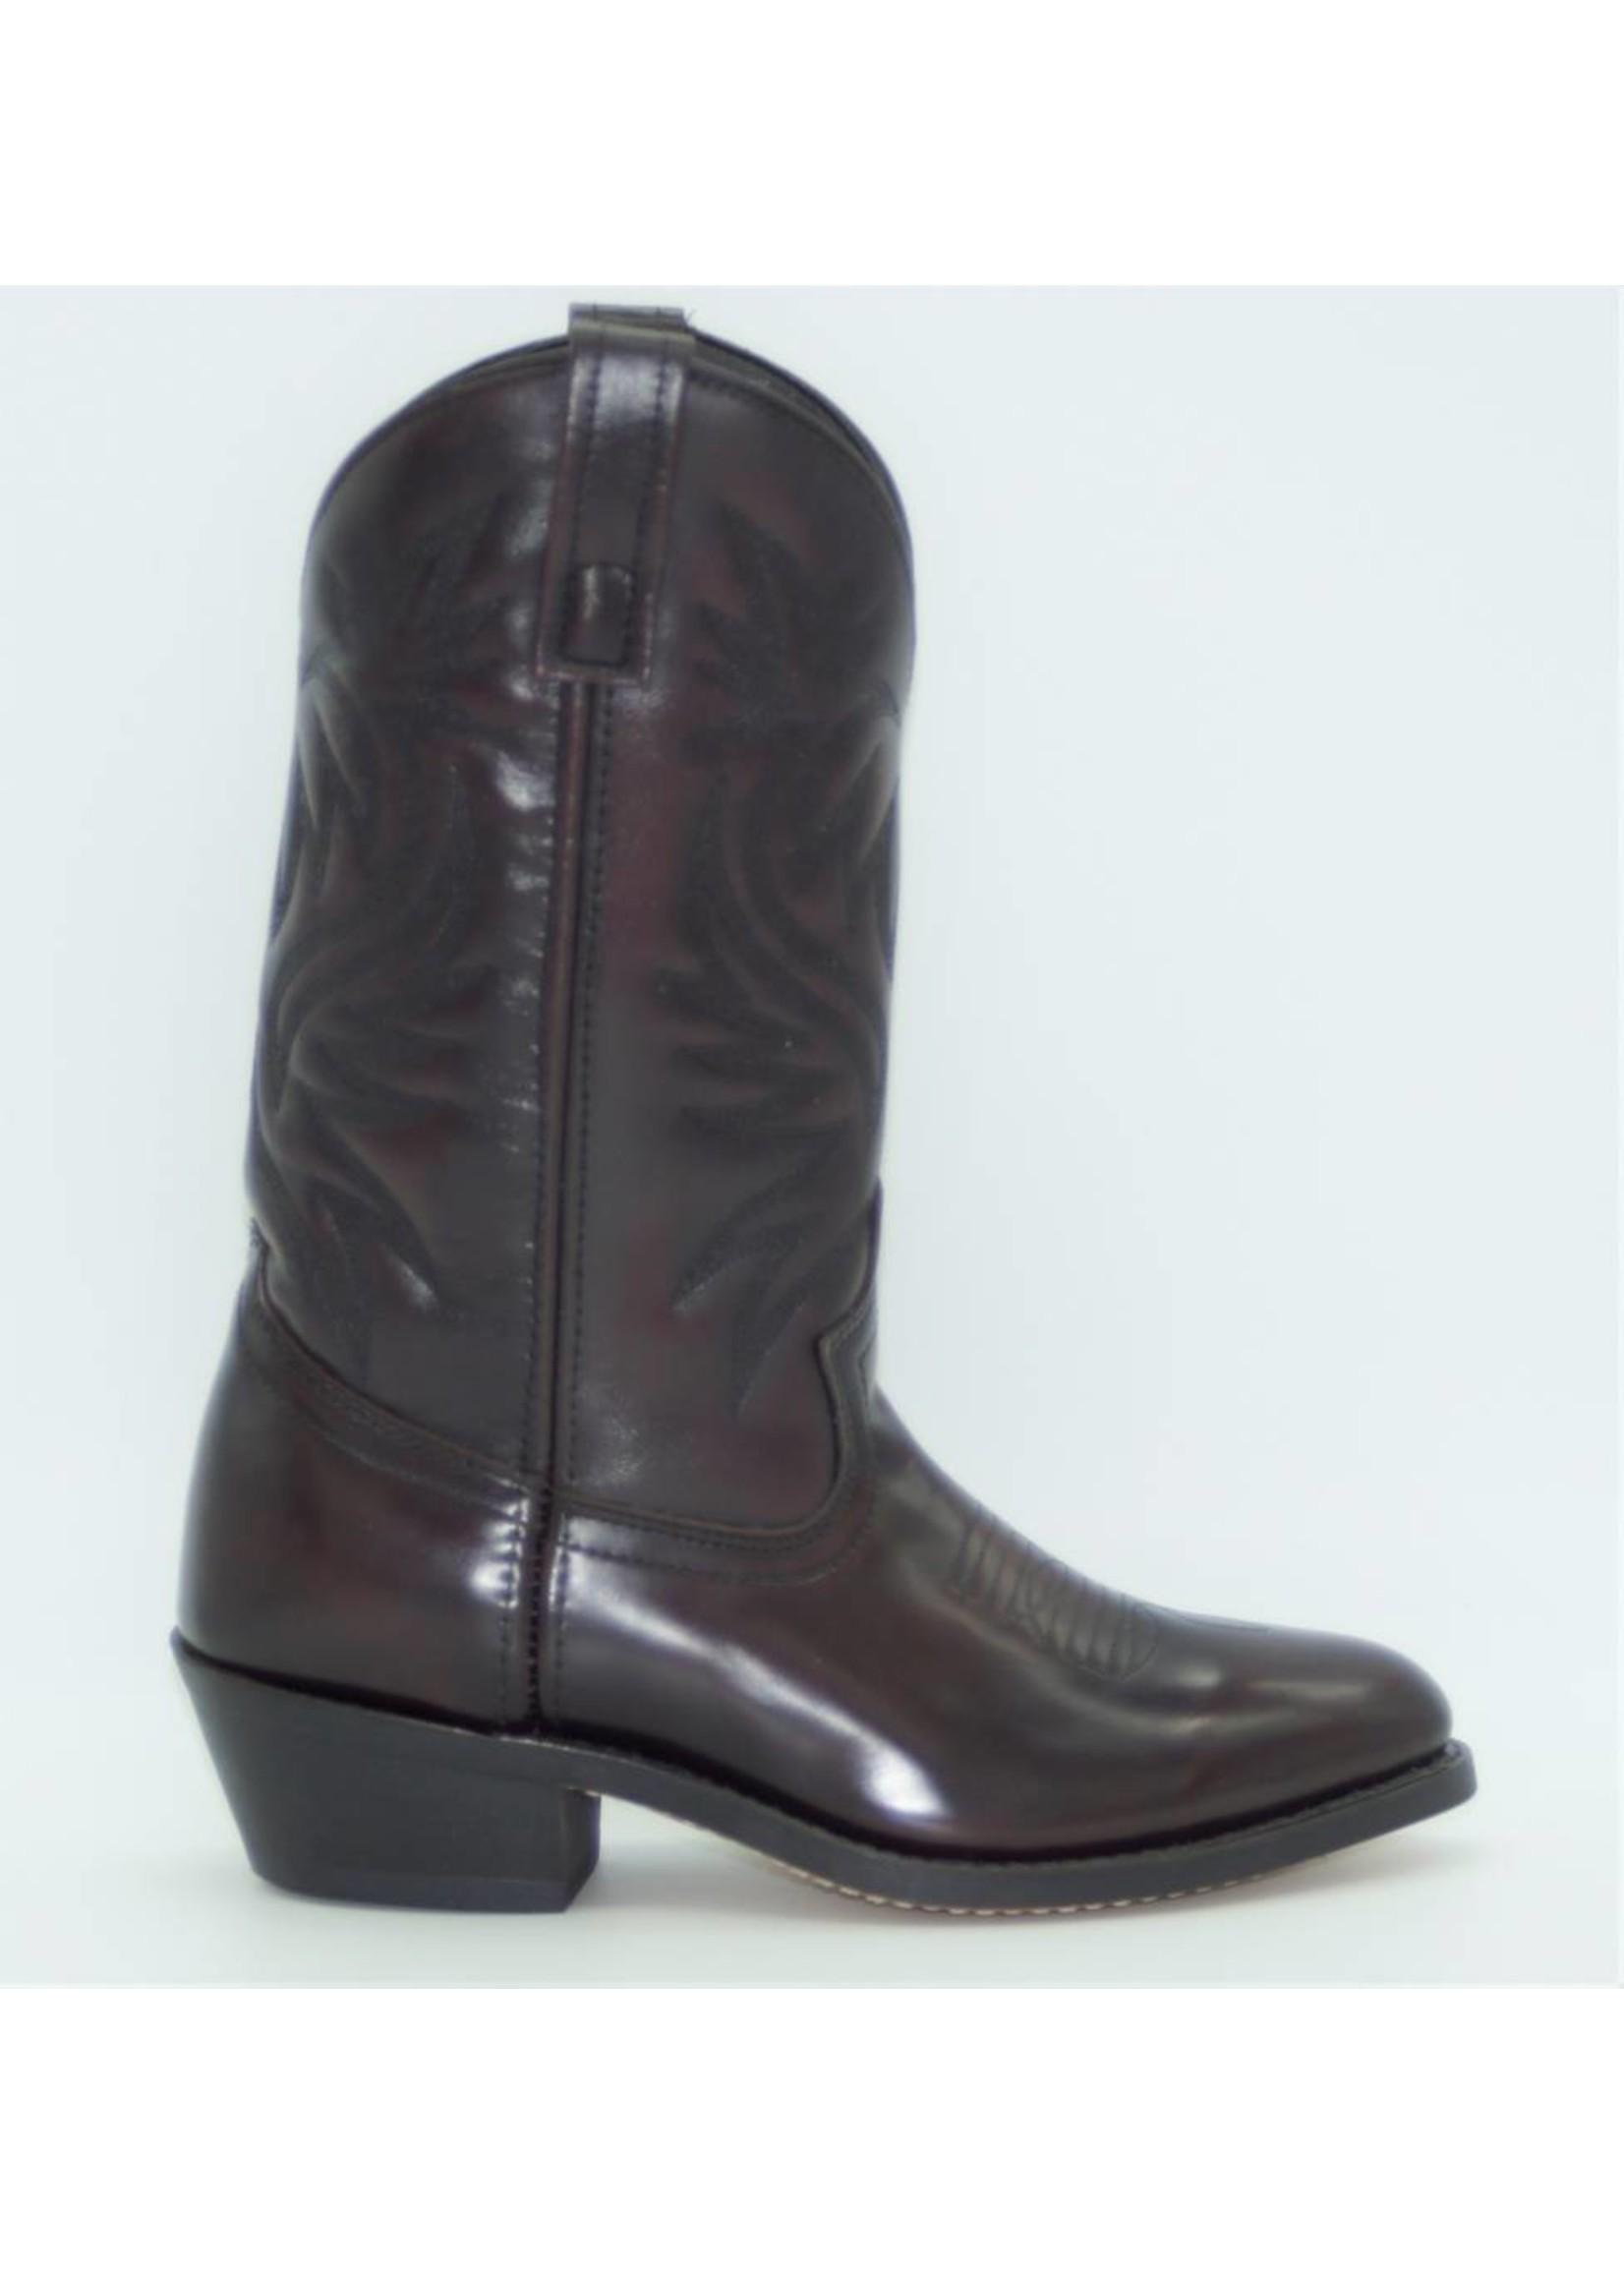 Laredo Laredo Men's London Black Cherry Leather Foot Western Boot 4216